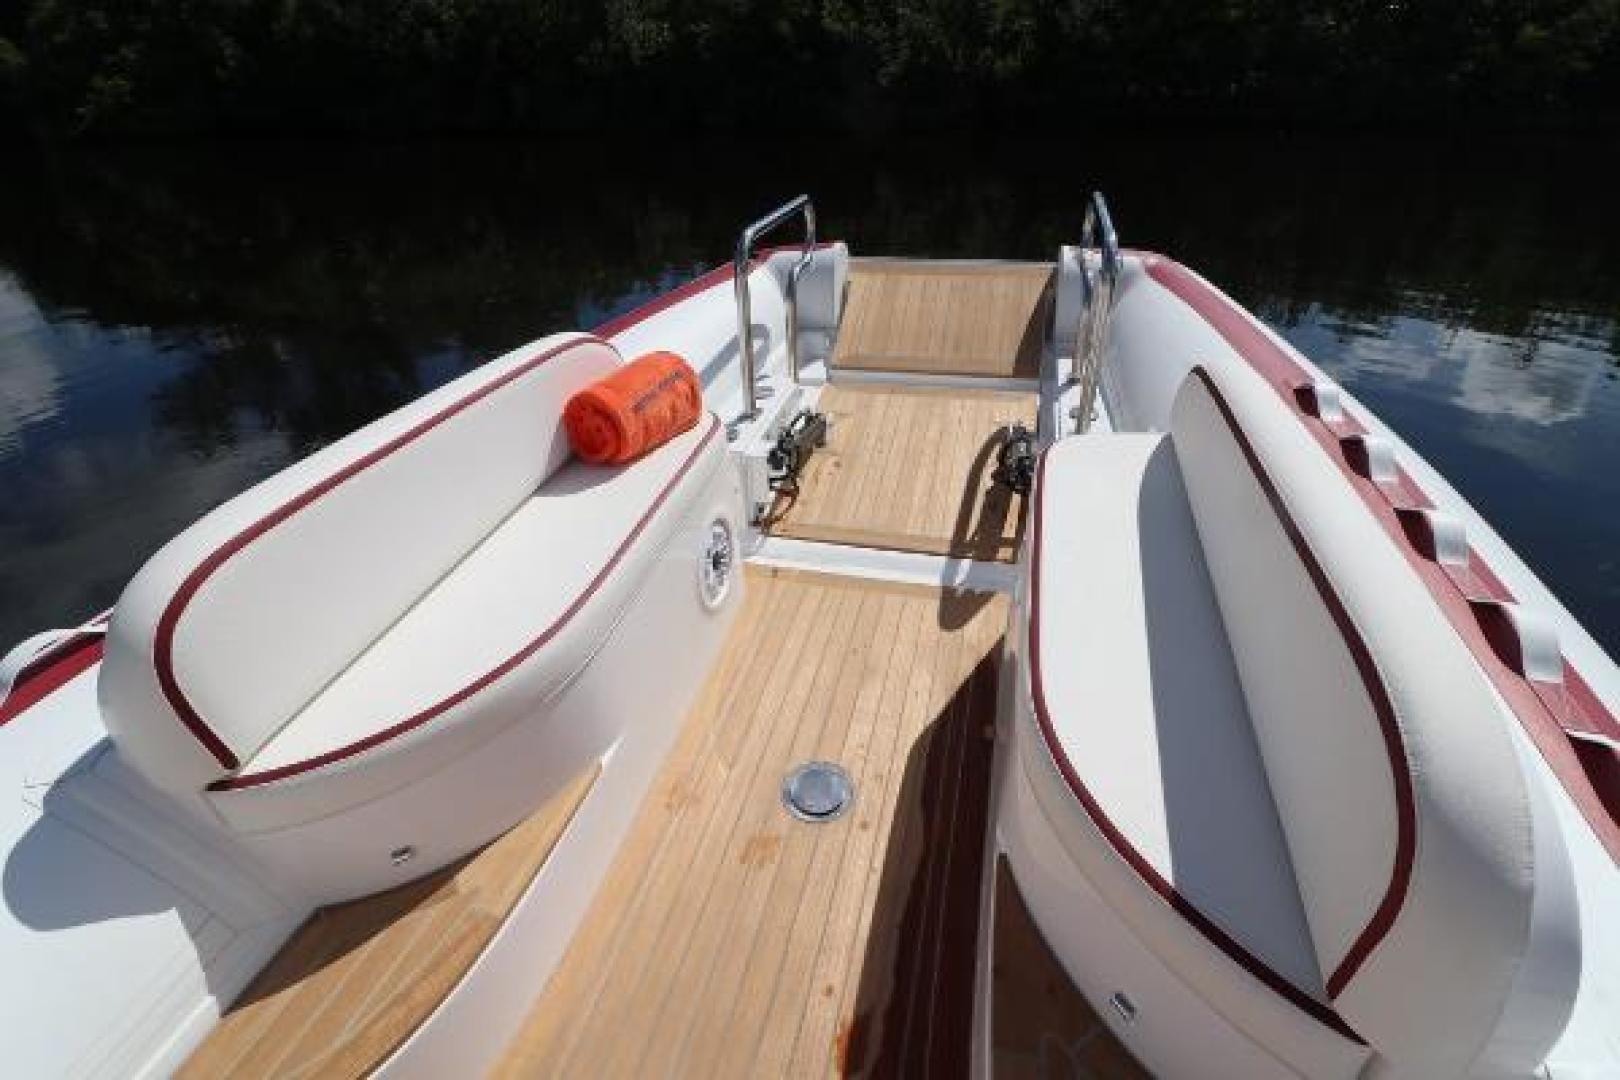 Novurania-Catamaran 24 2017-Novurania Catamaran 24 Fort Lauderdale-Florida-United States-1530849   Thumbnail